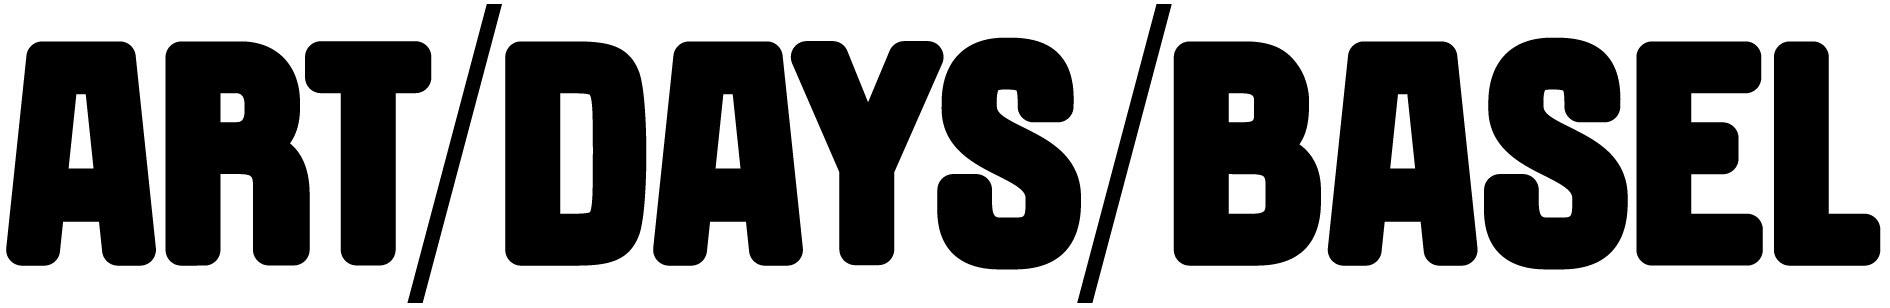 ADX_Basel_logotype_black.jpg